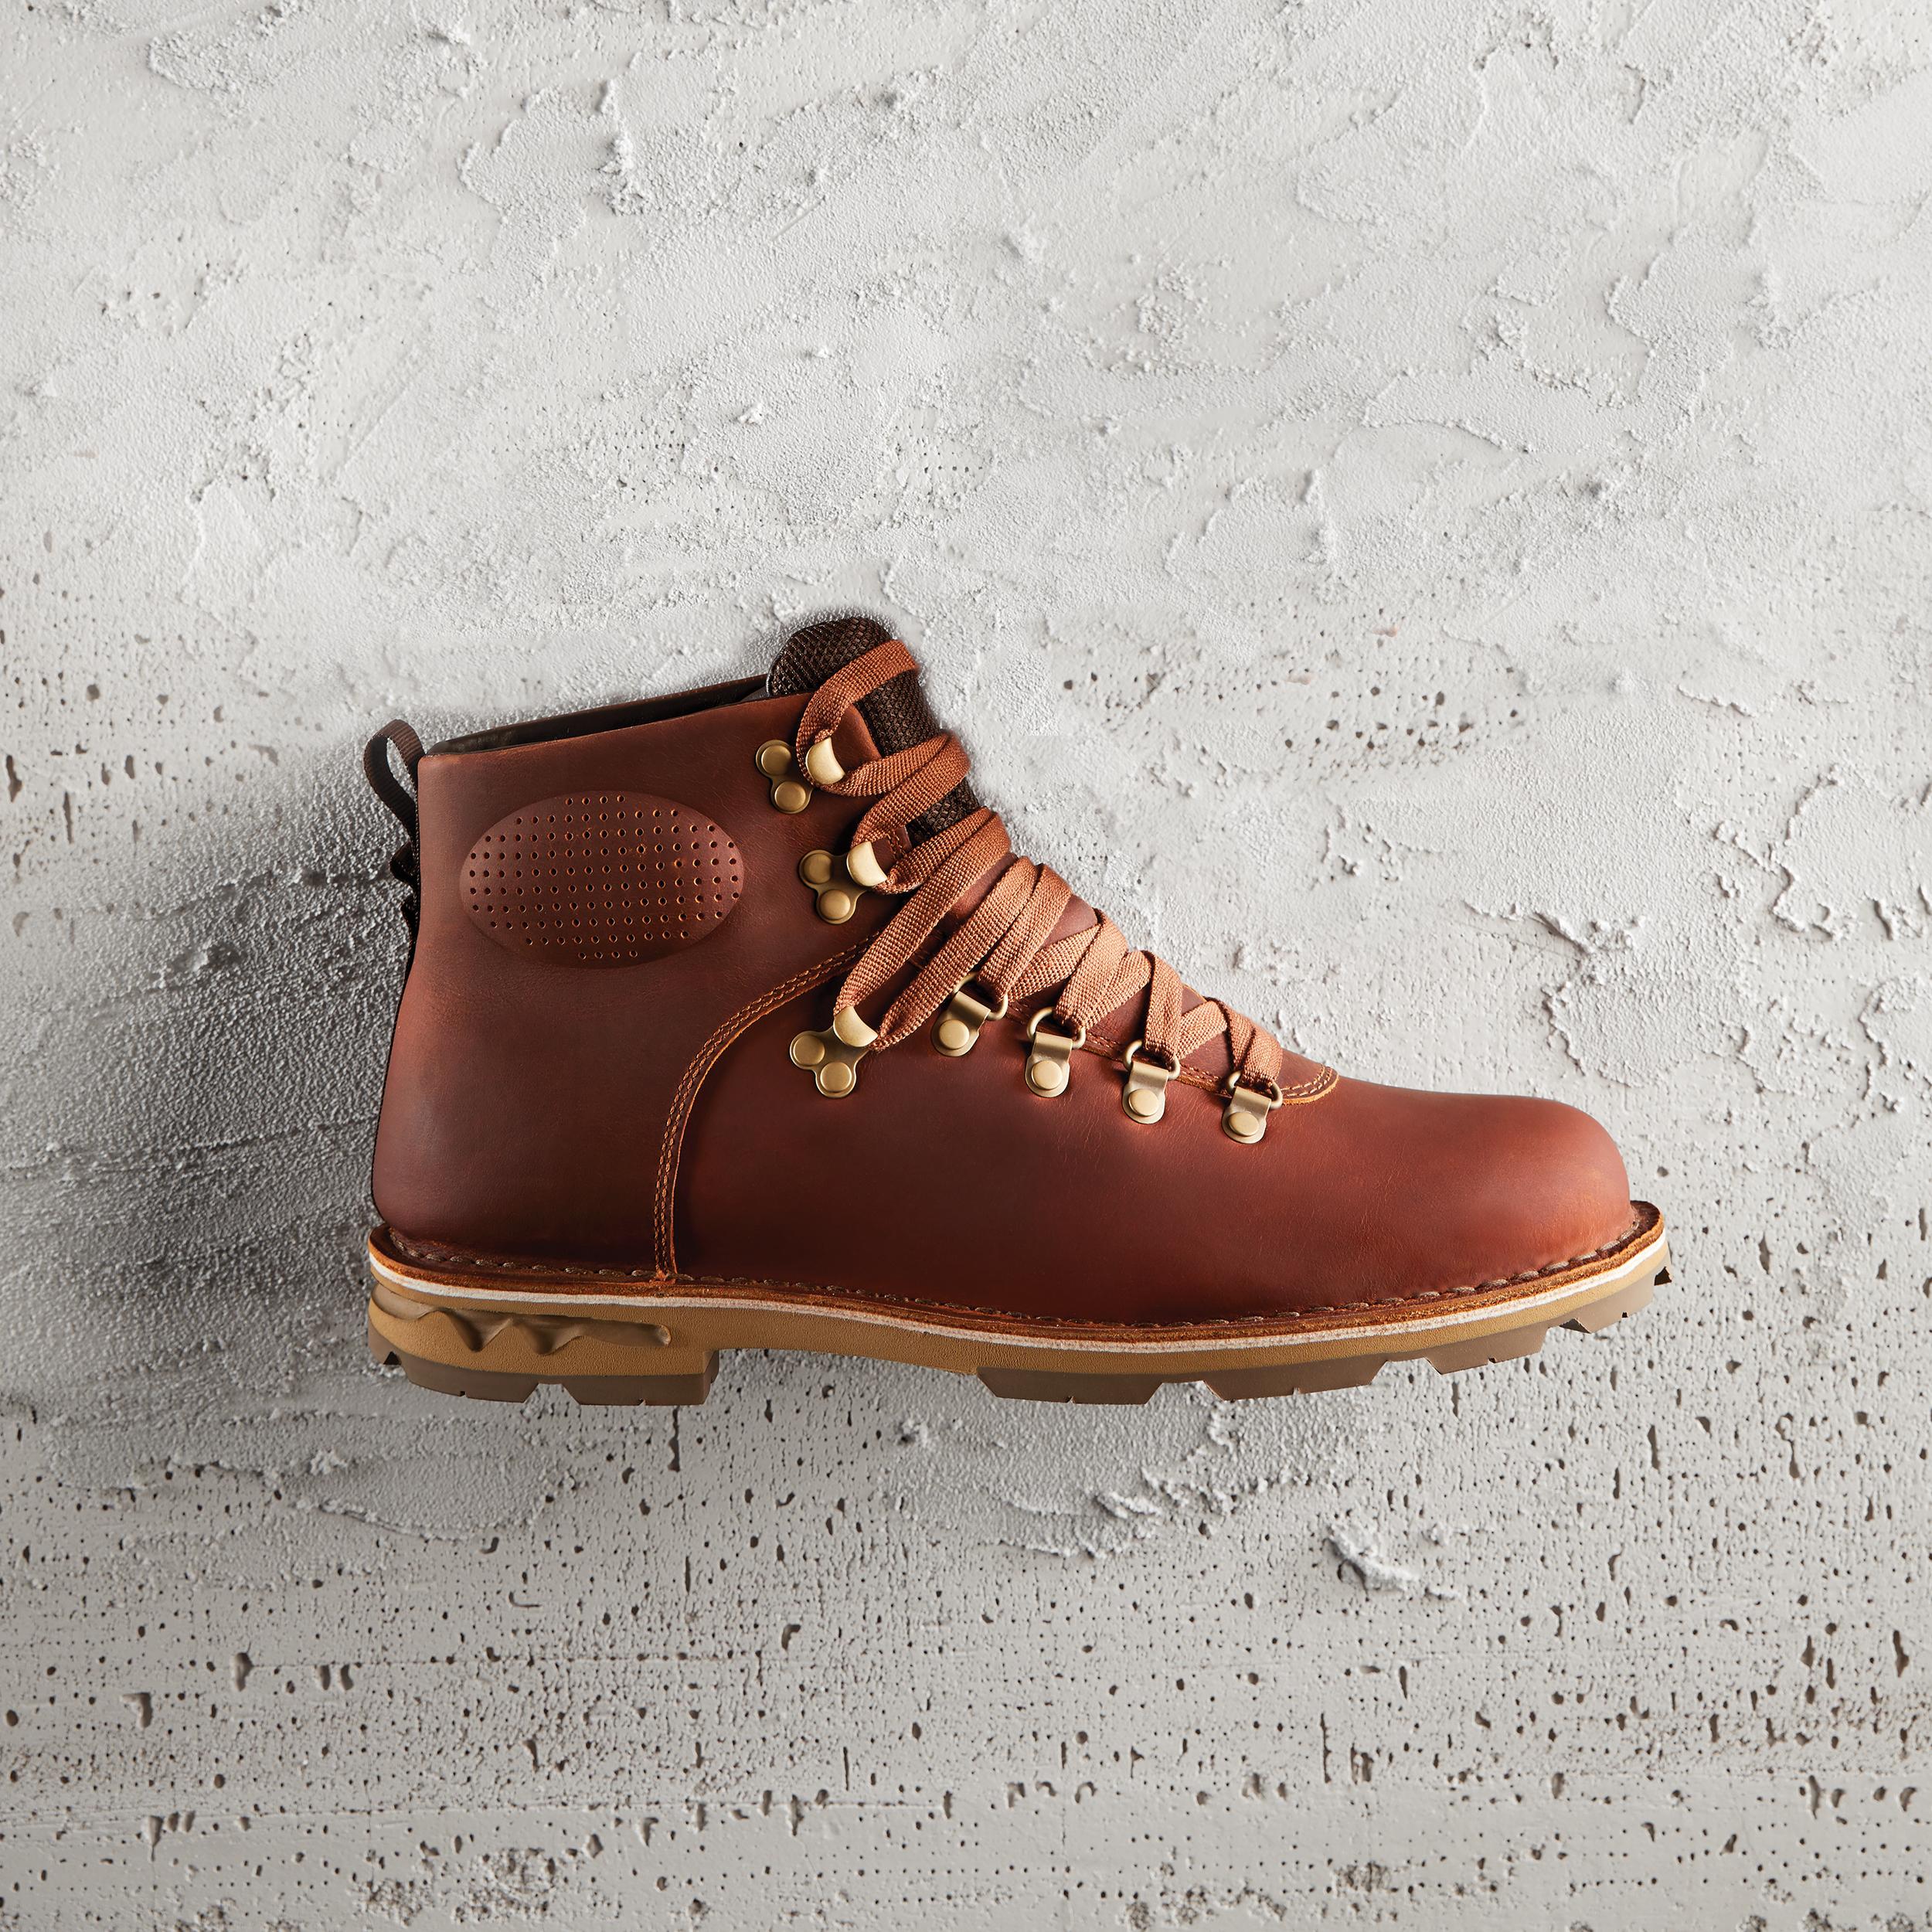 fced64af2d Merrell Sugarbush Braden Mid Leather Waterproof Boots - Men's